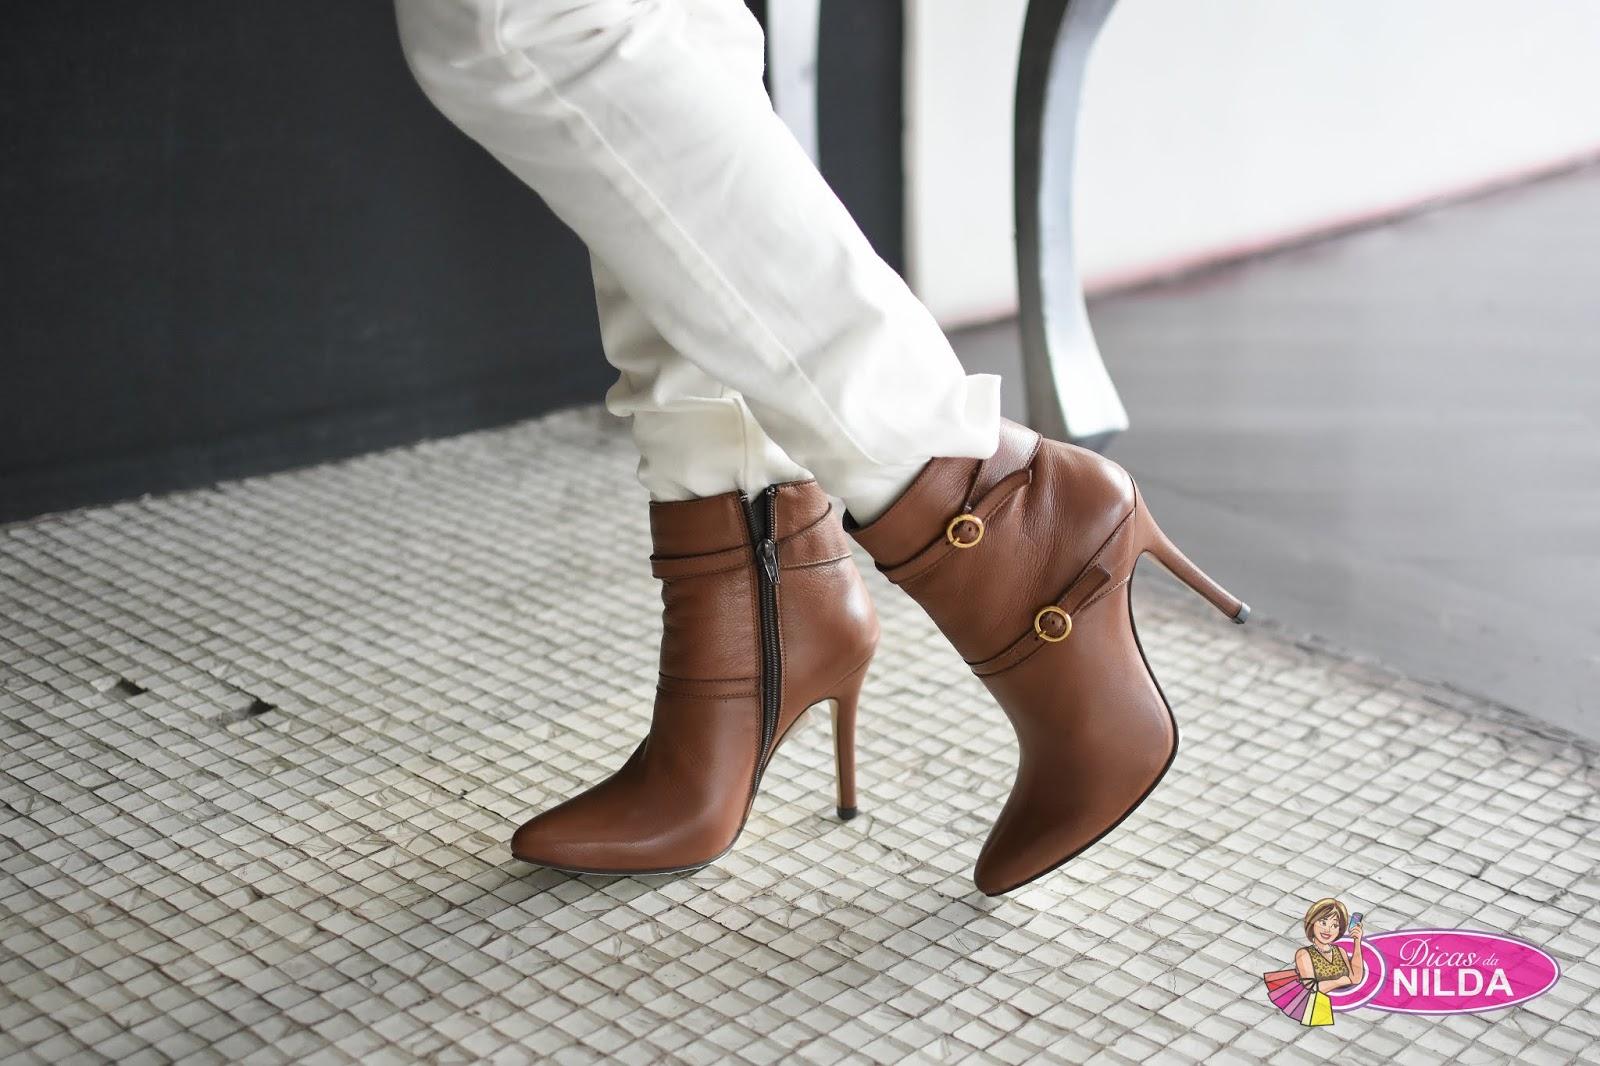 3b24c3f14 Vestido dupla face Forum. Unkle boot e sandálias Suzzara.